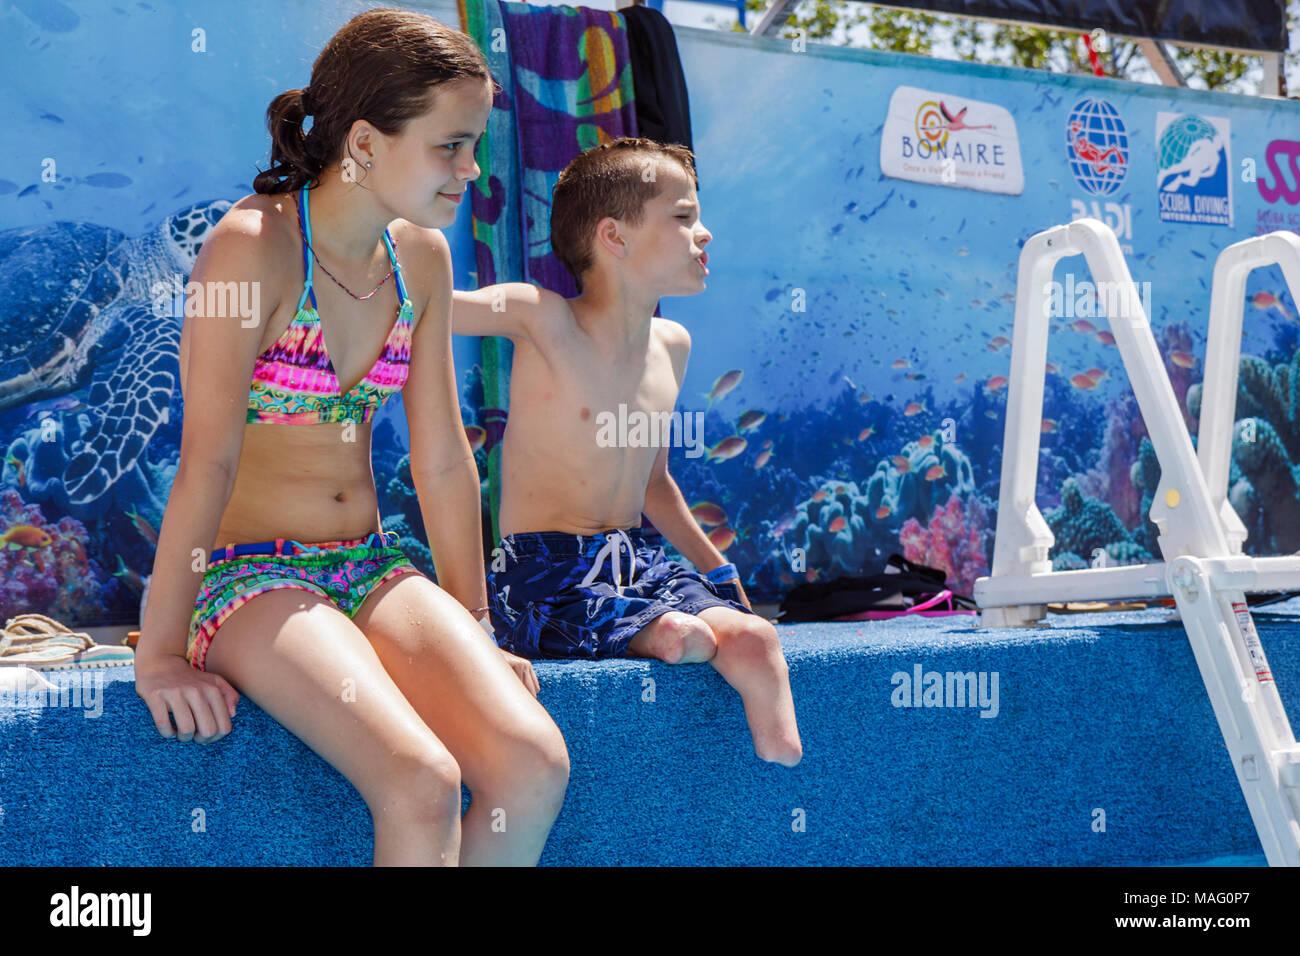 Miami Coconut Grove, Florida Shake-a-Leg Miami sin barreras Festival agua instalación deportiva sin ánimo de lucro discapacitados discapacidad física Imagen De Stock